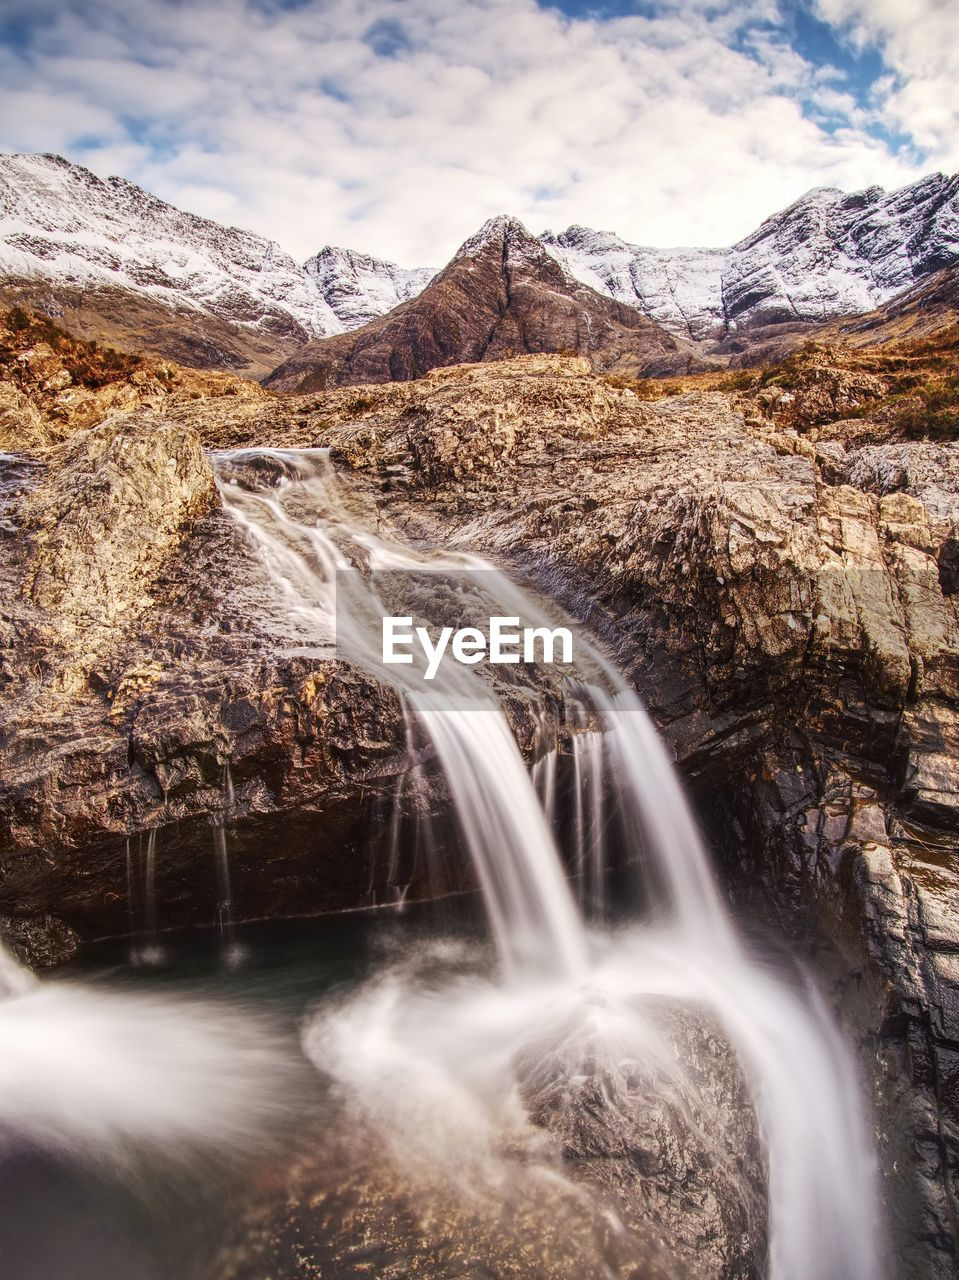 Rapids and small waterfall on the river coe, glencoe mountain, scotland , united kingdom,